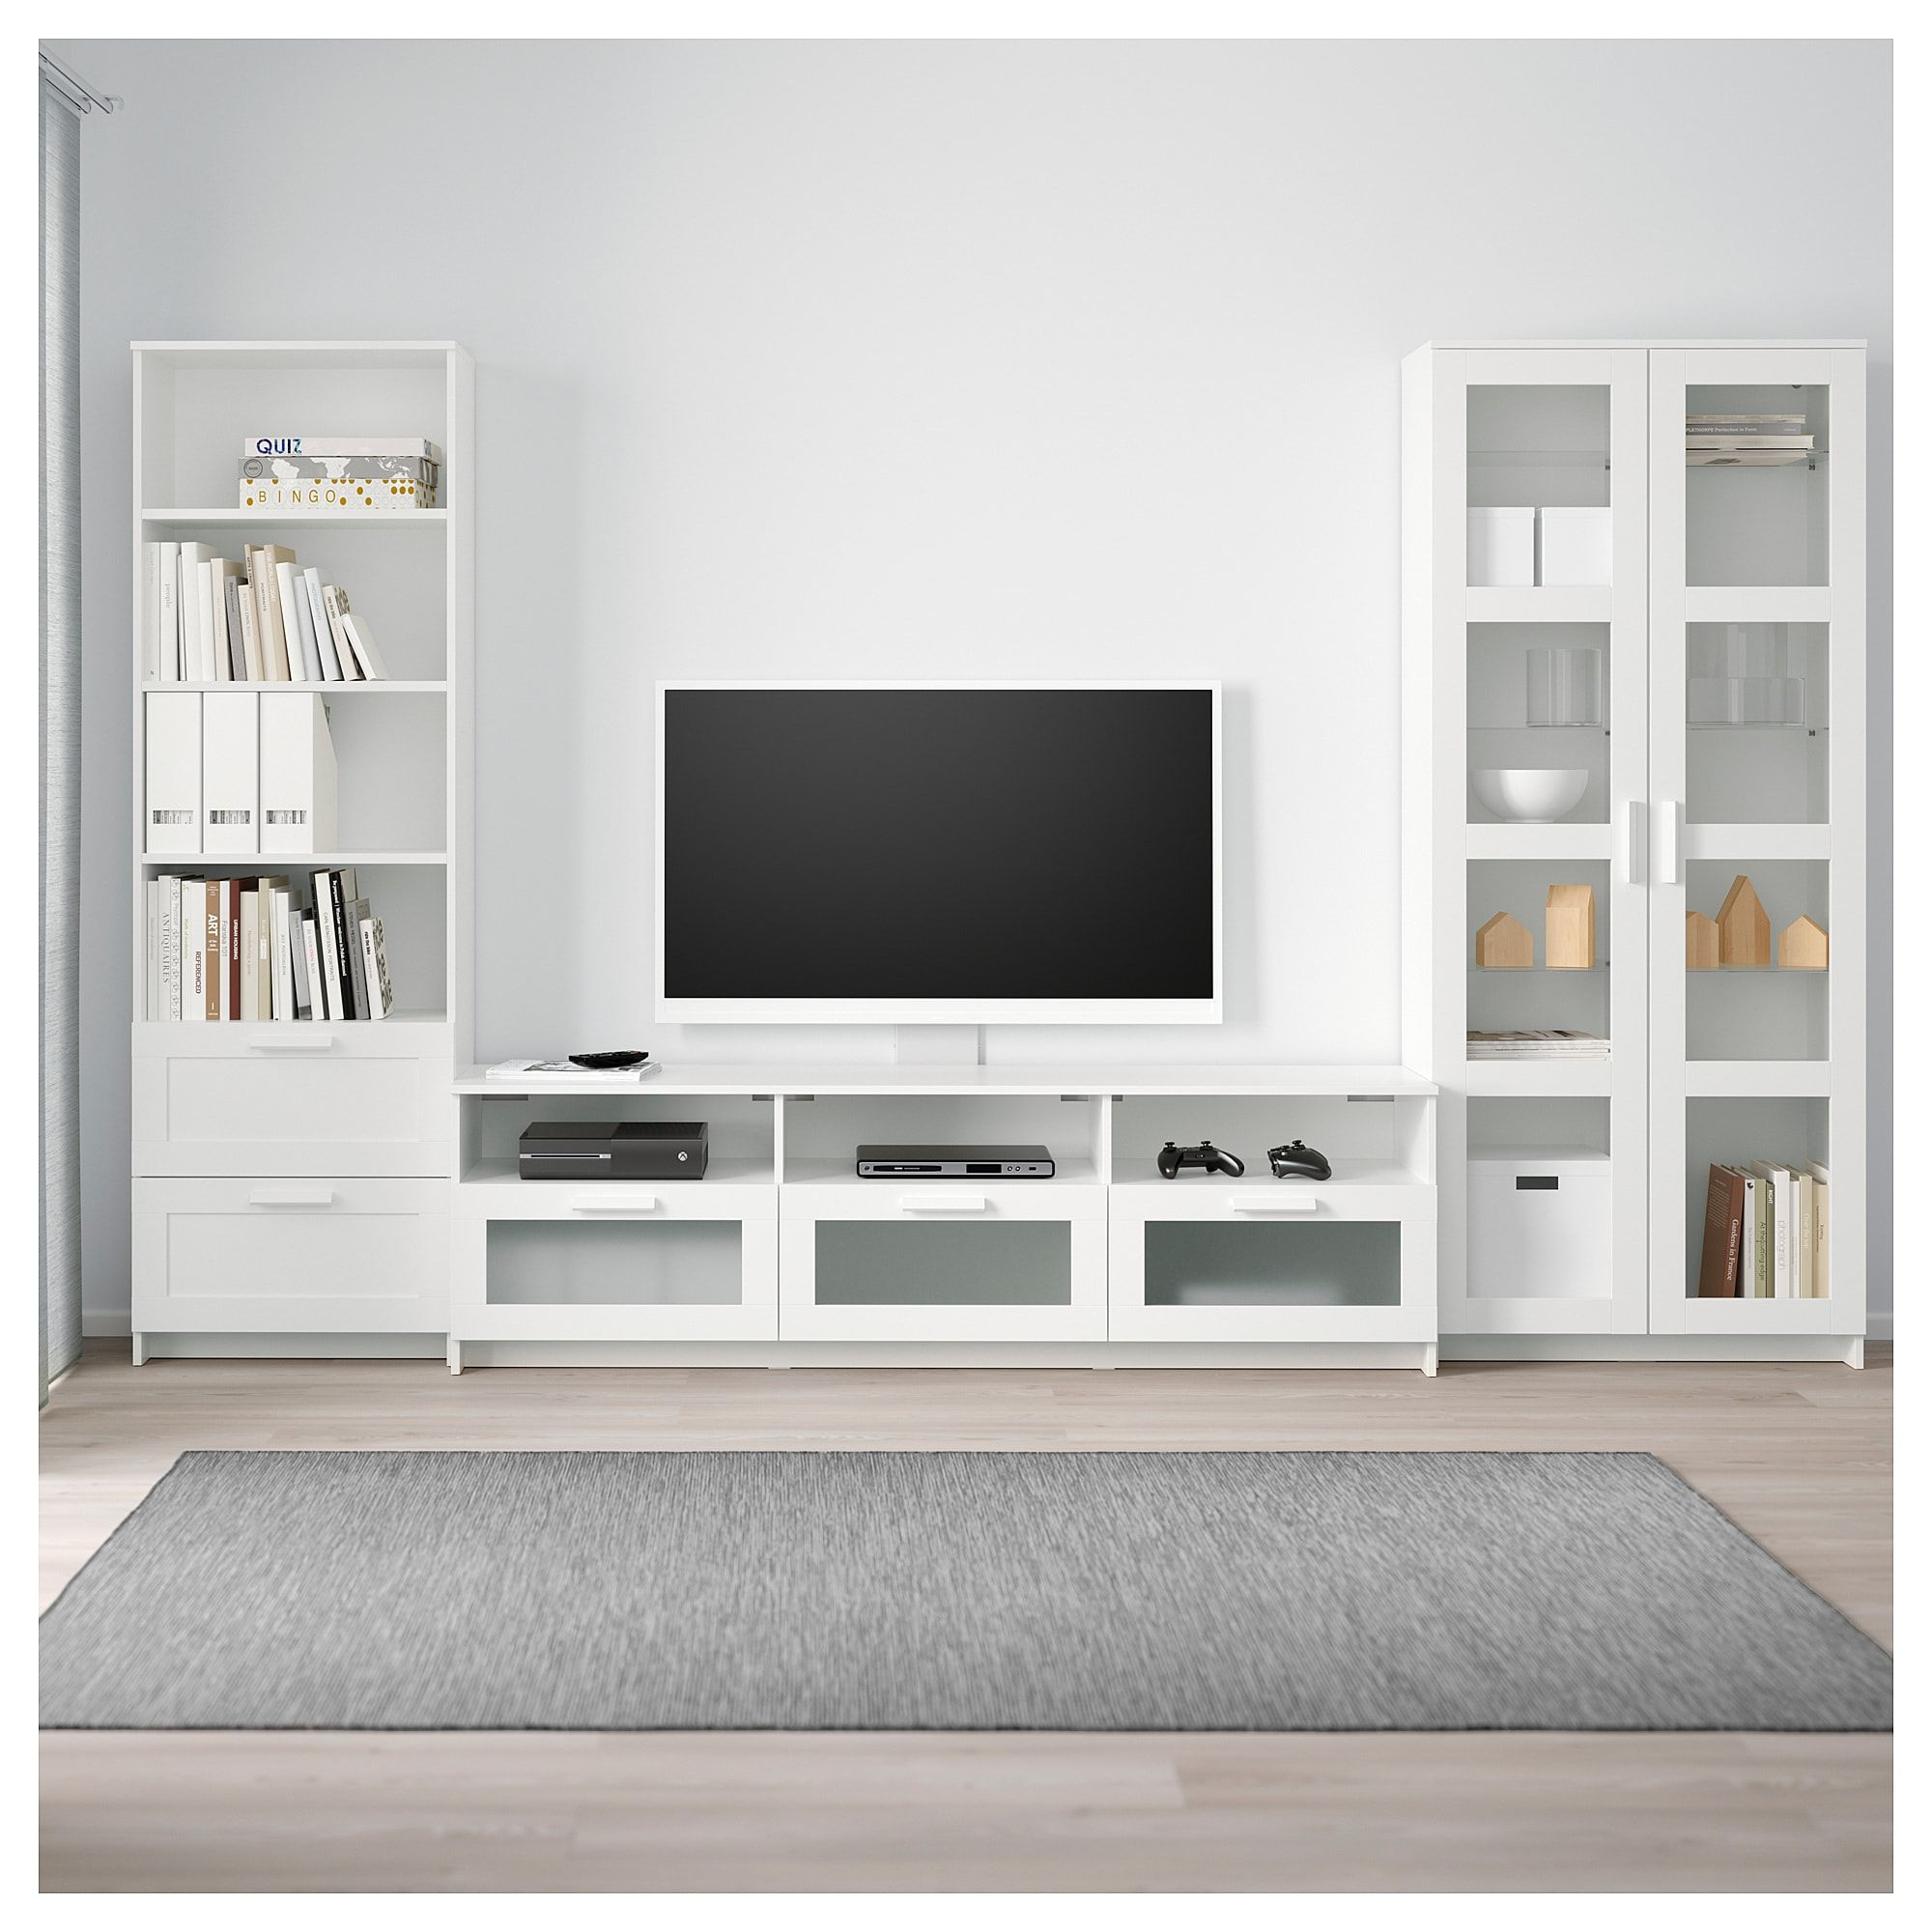 Brimnes Tv Storage Combinationglass Doors White In 2019 Around